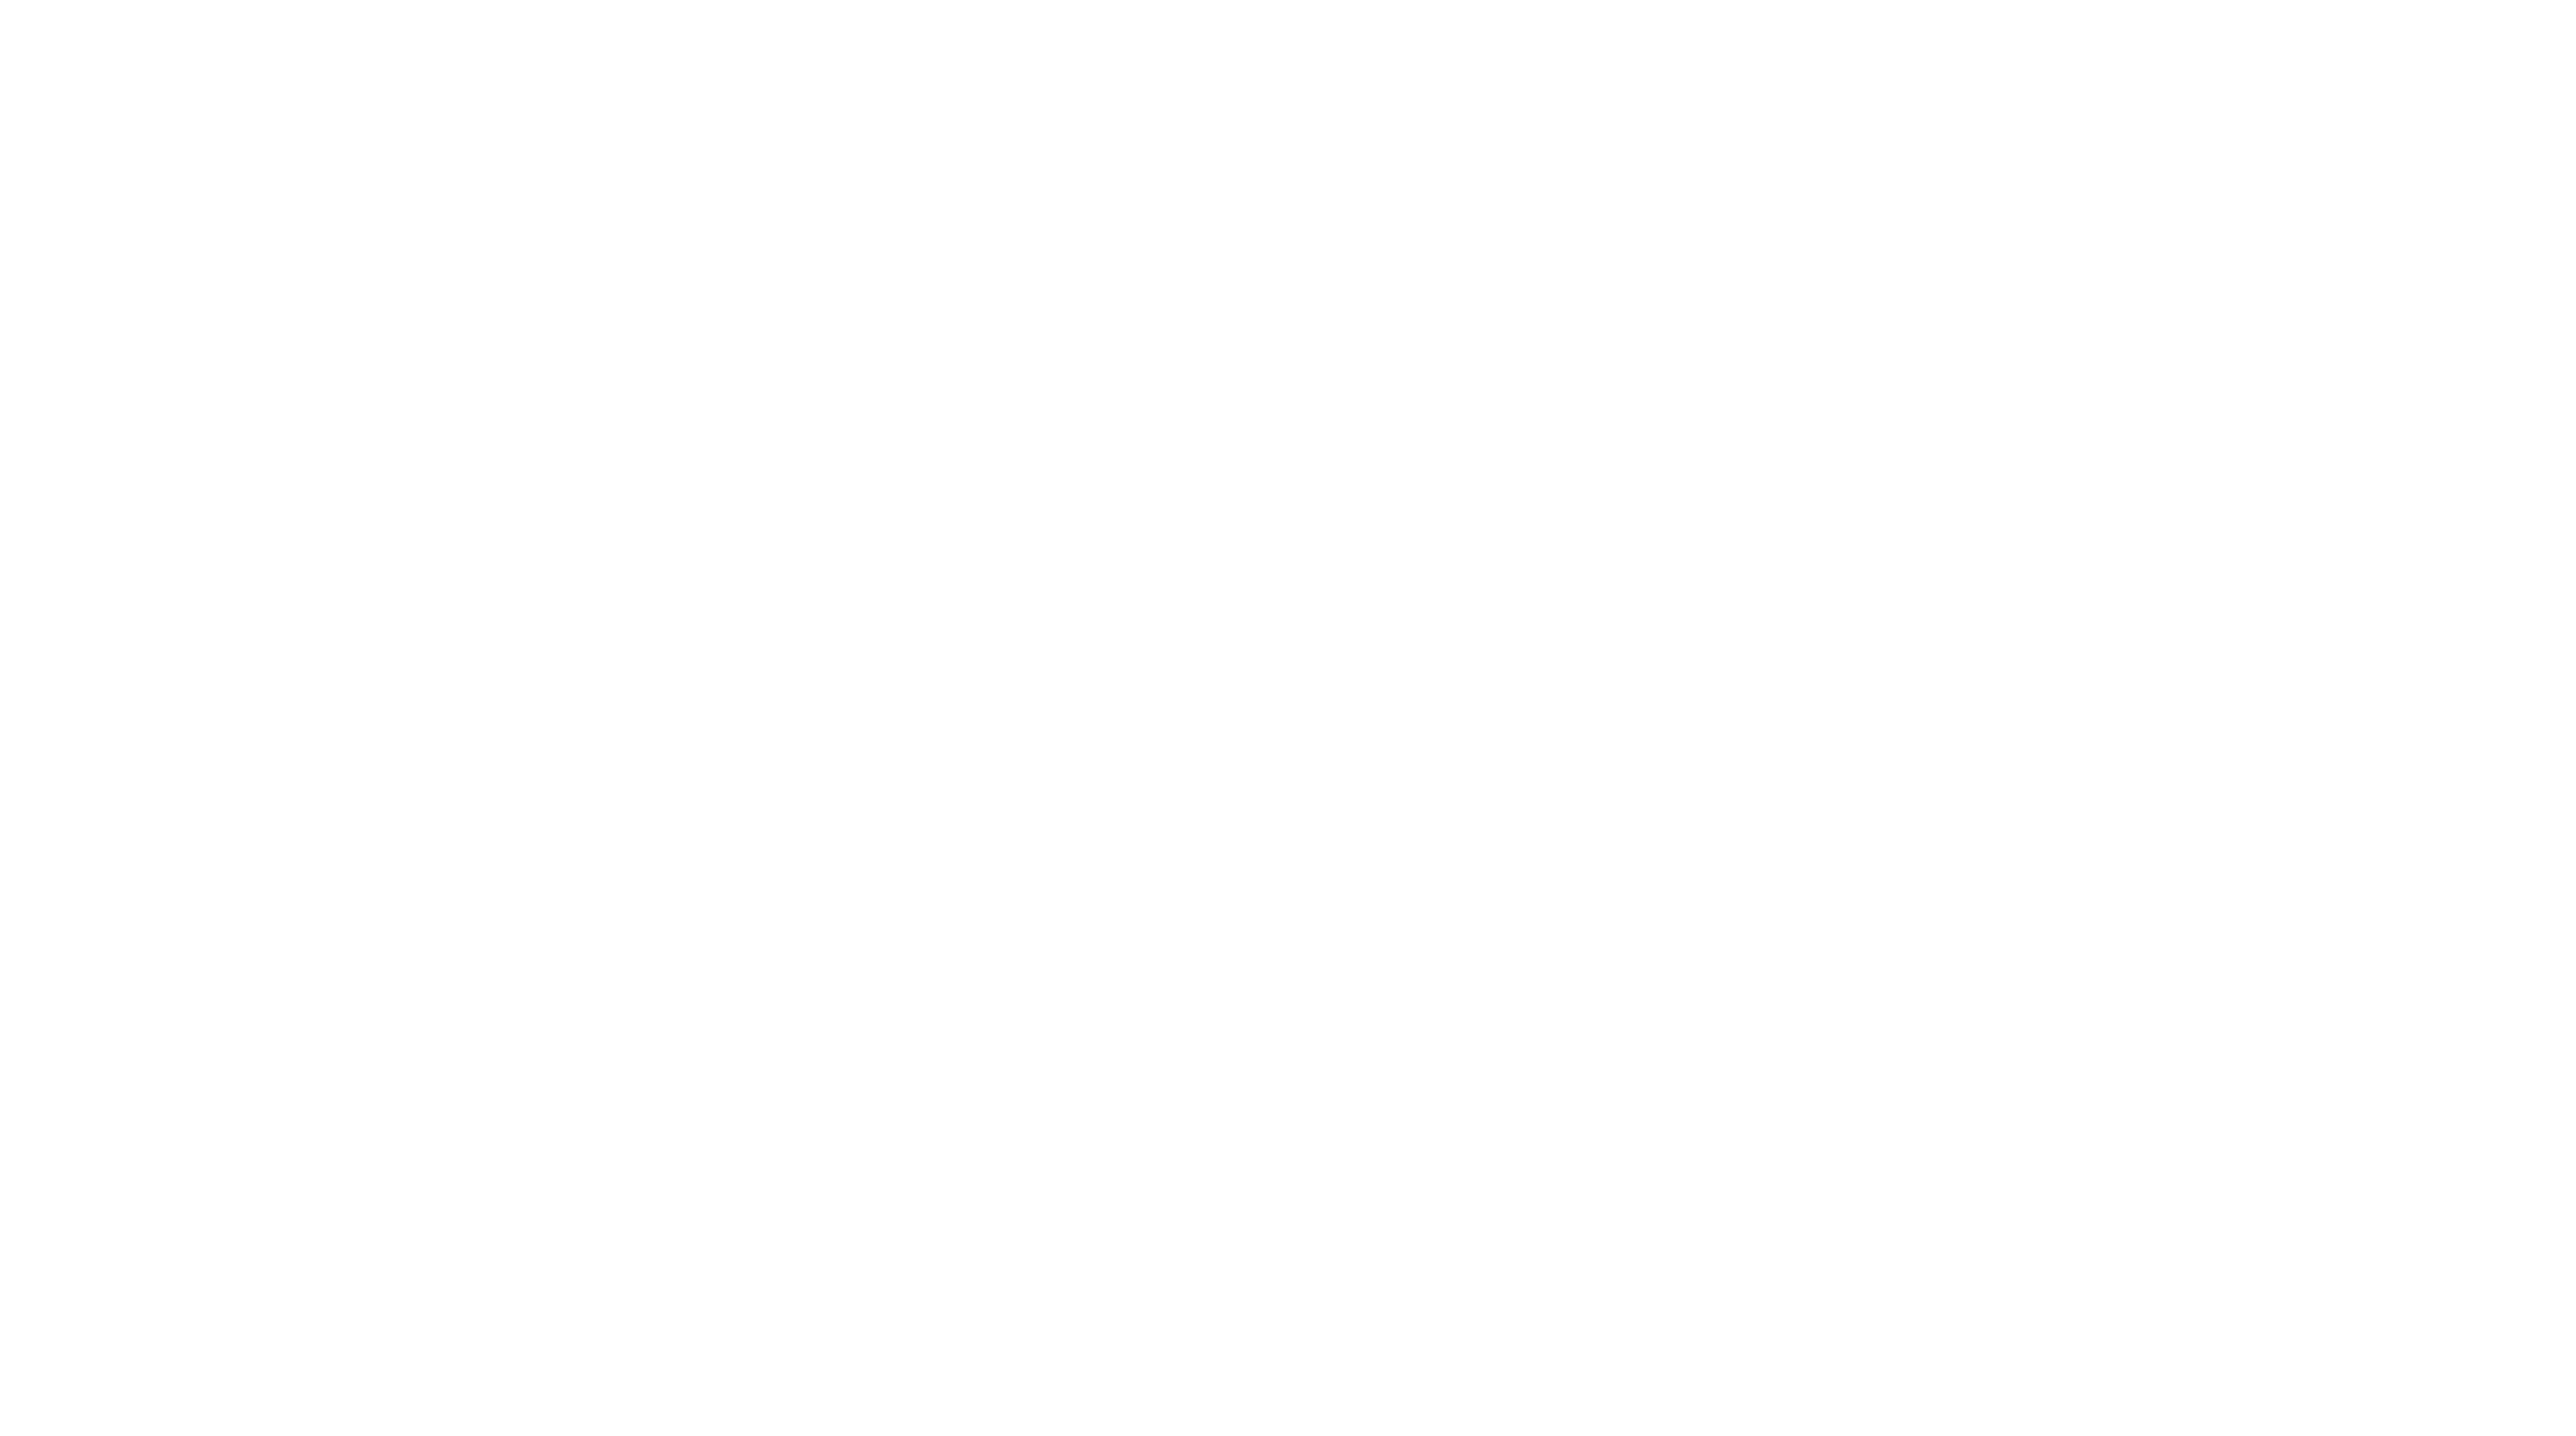 Preparing To Celebrate Christ At Easter logo